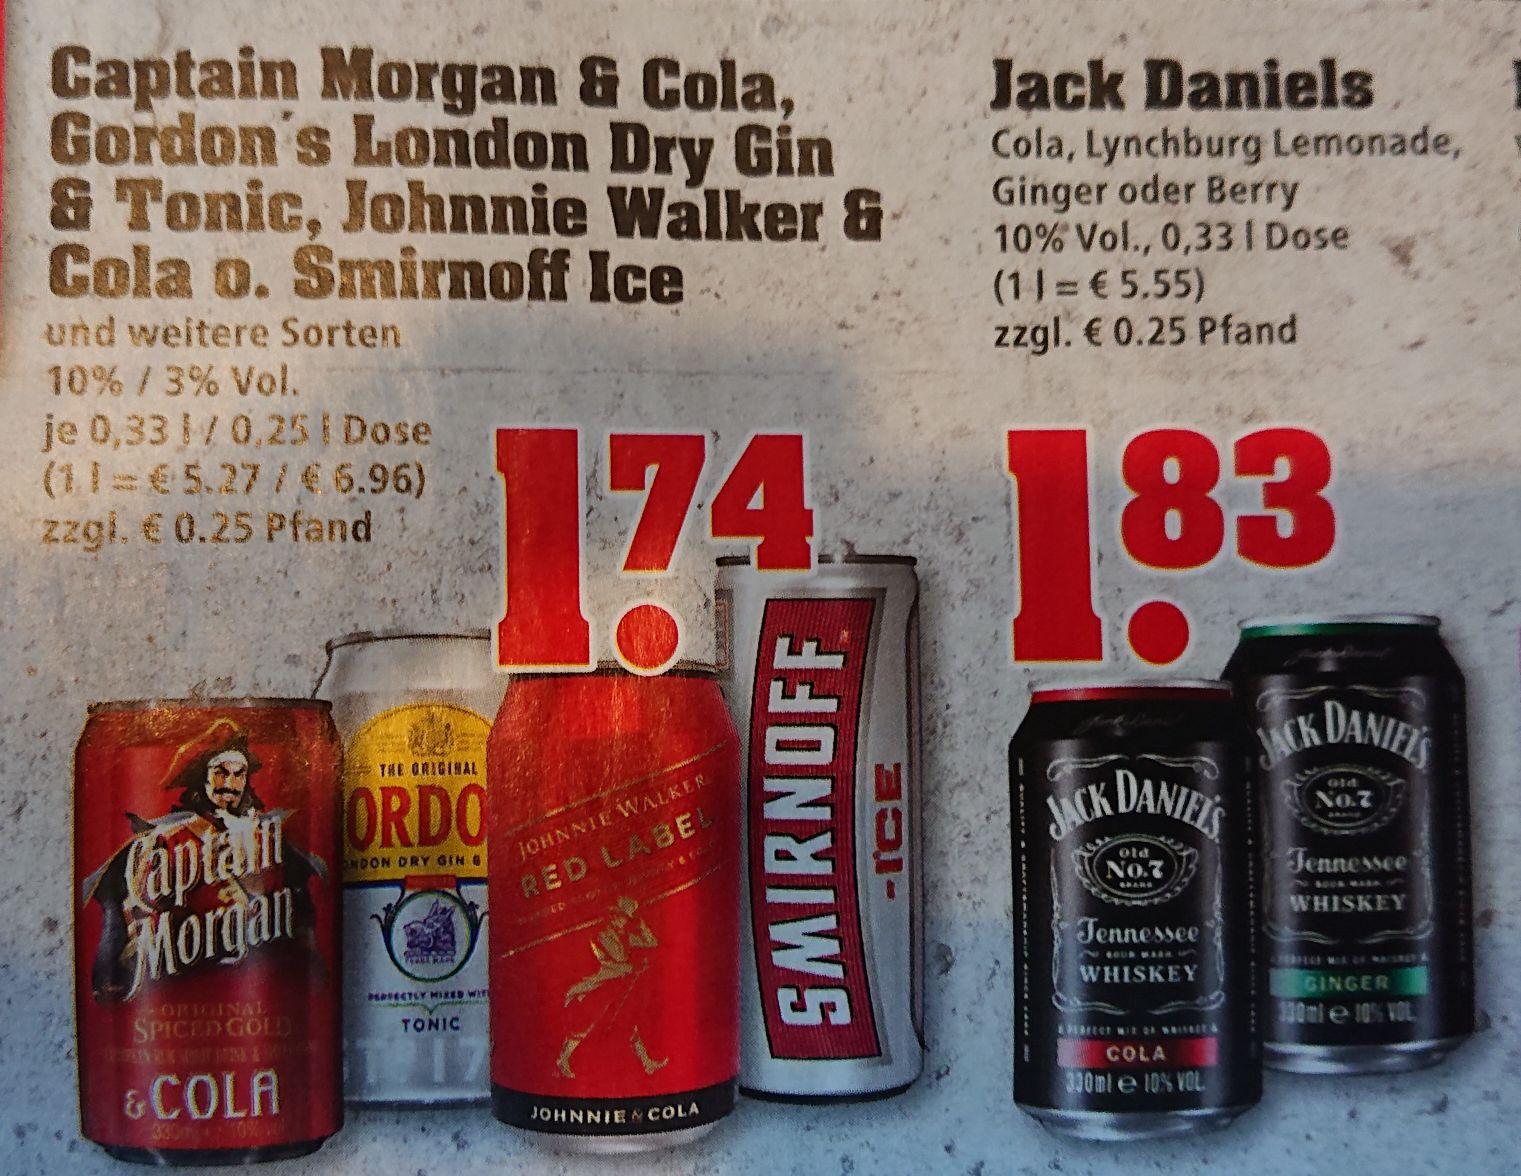 Smirnoff Ice / Captain Cola 1,74 € | Jack Daniel's (Daniels) Cola 1,83 € [trinkgut] [26. - 31.10.]